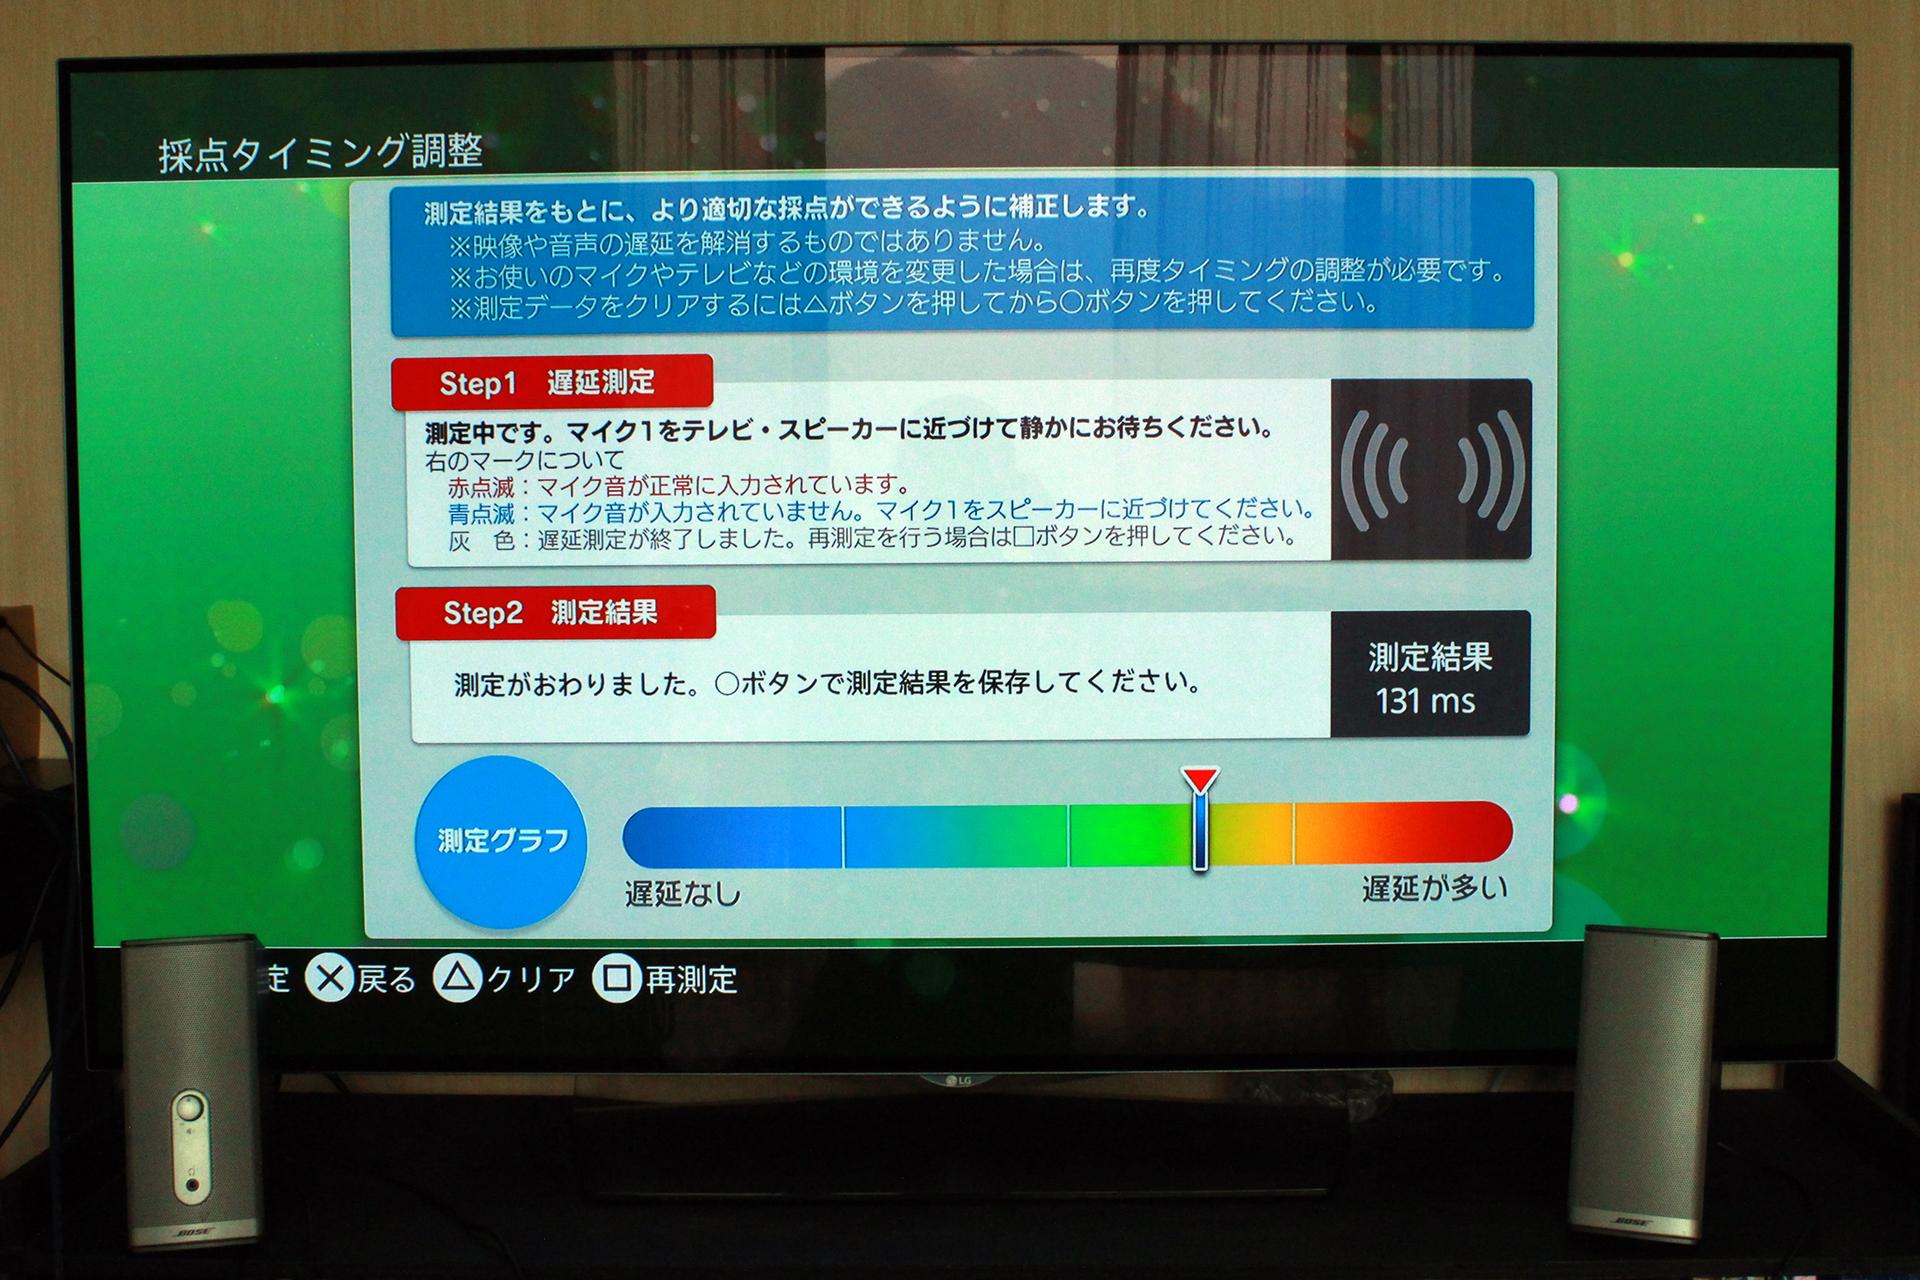 DUALSHOCK 4ヘッドフォン端子(ワイヤレス接続)からPCスピーカー出力